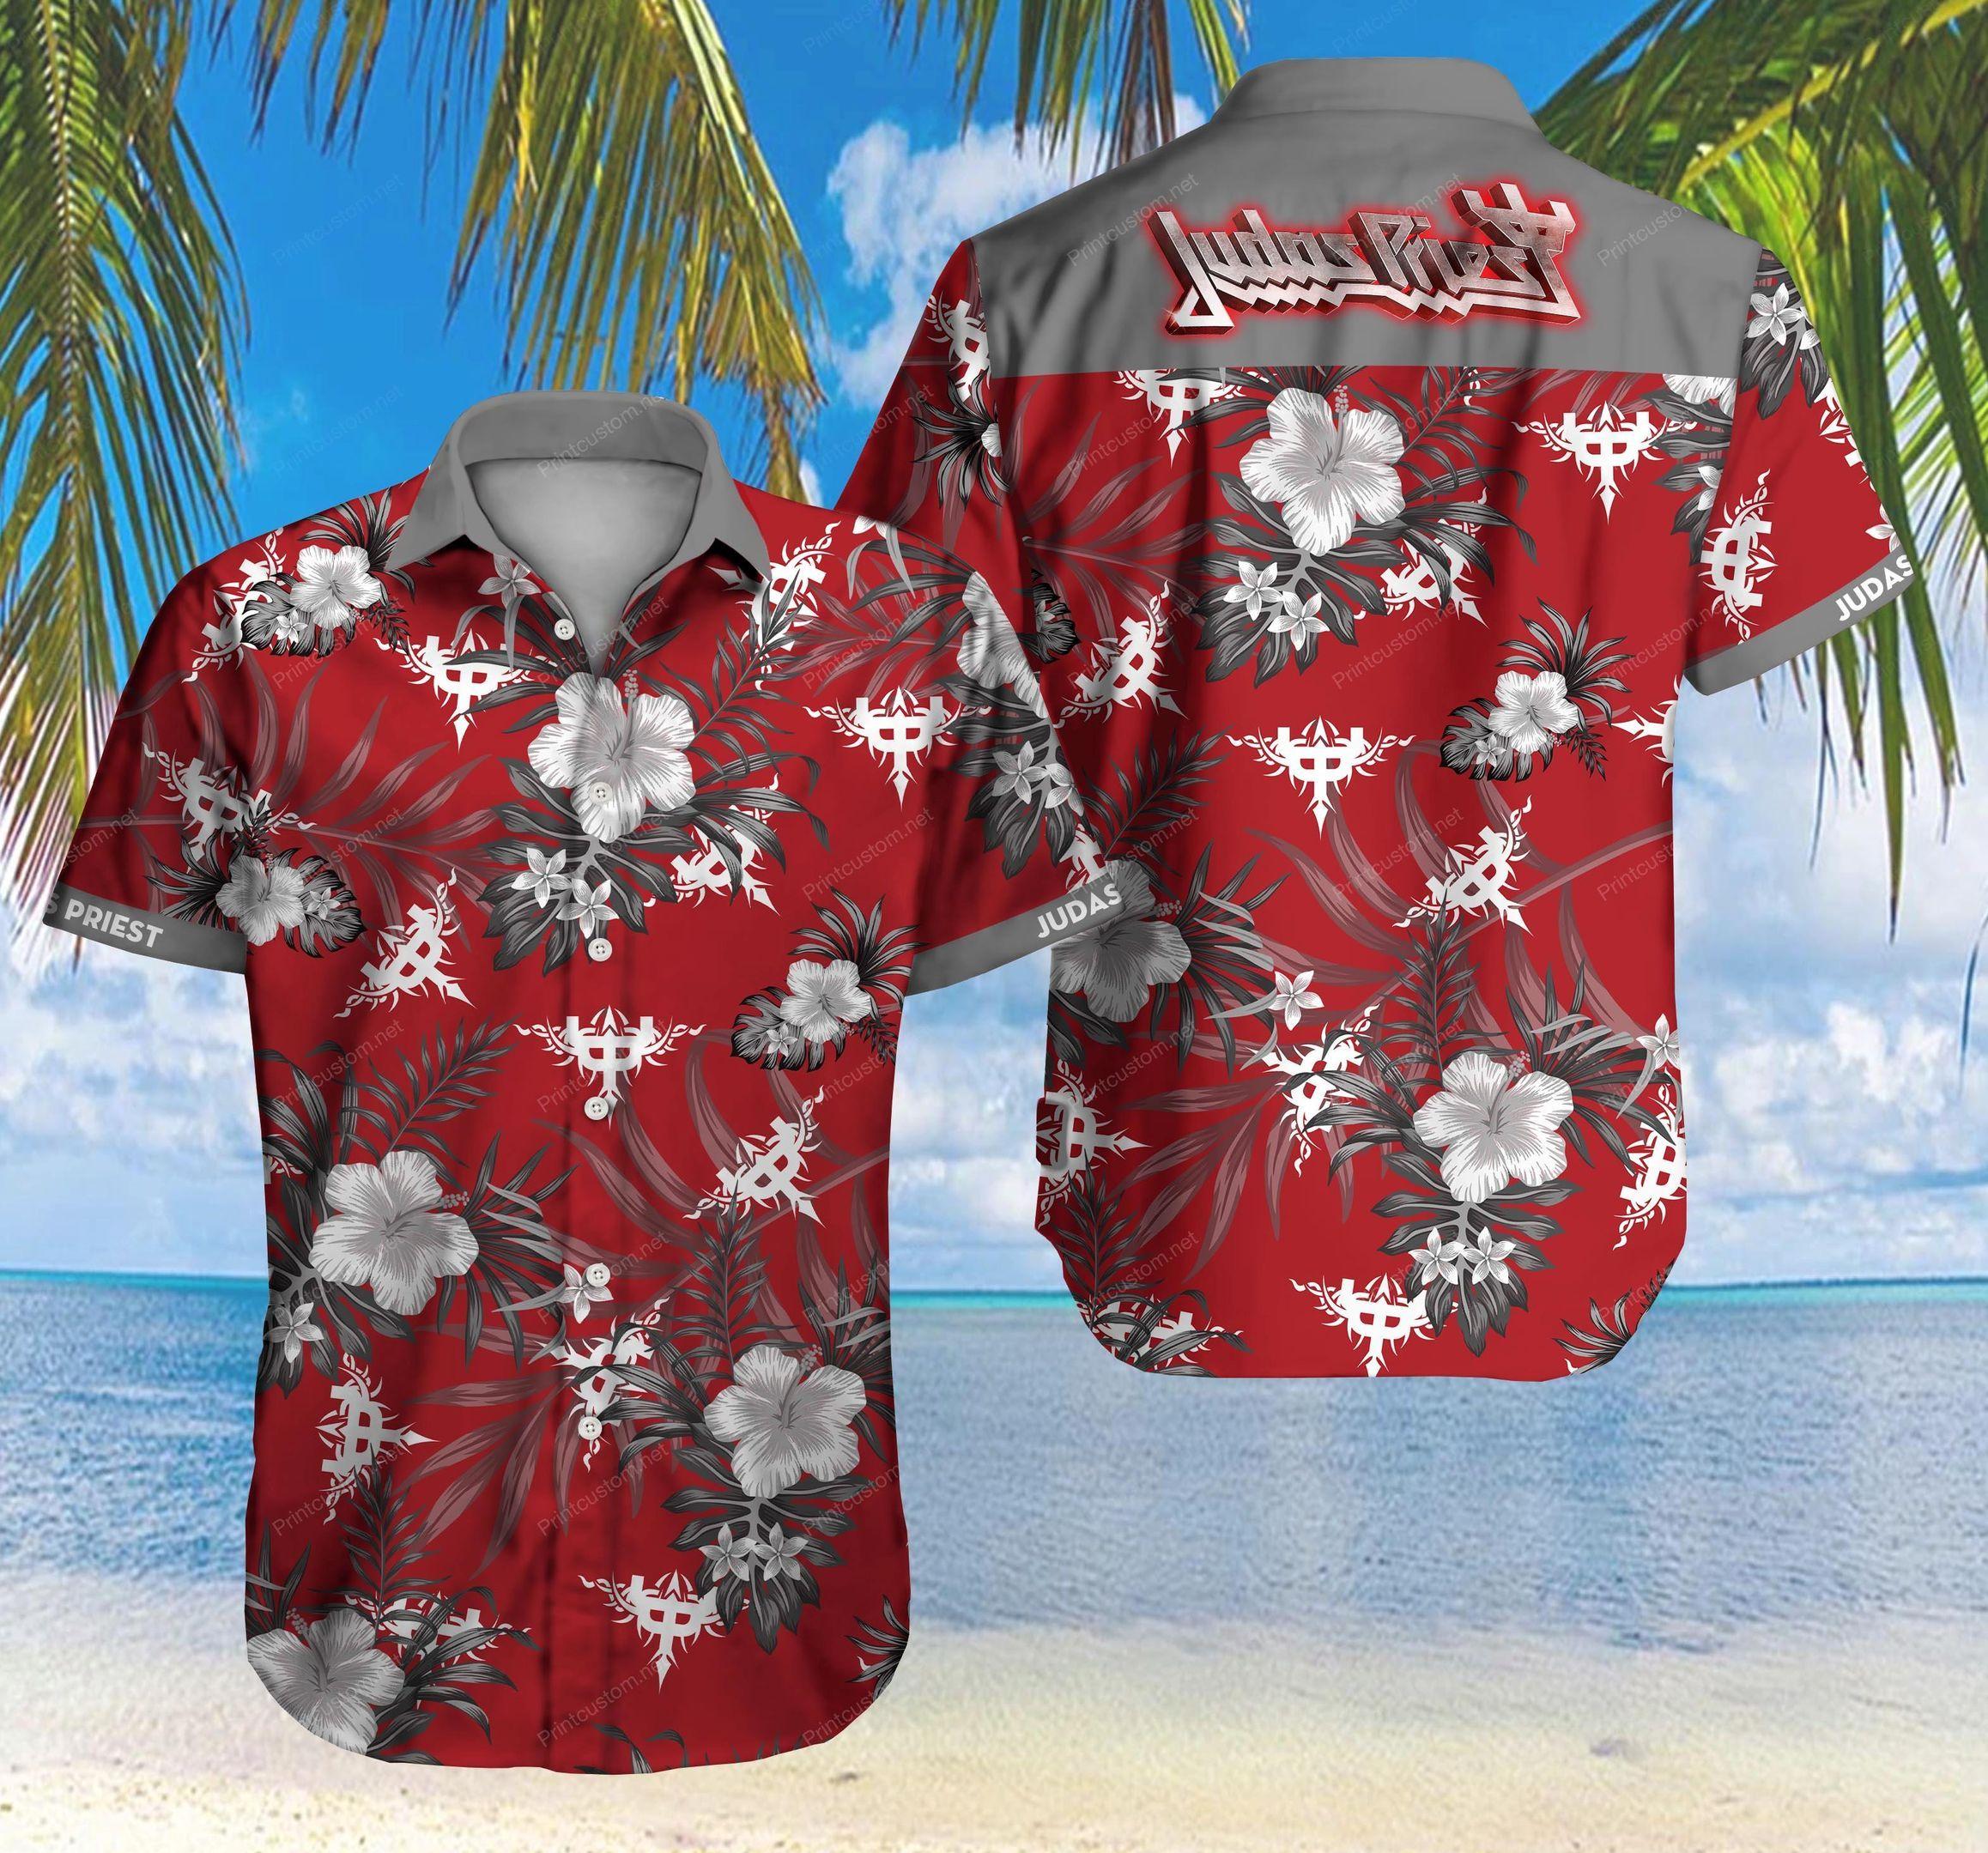 Judas Priest heavy metal band Hawaiian Shirt Summer Shirt